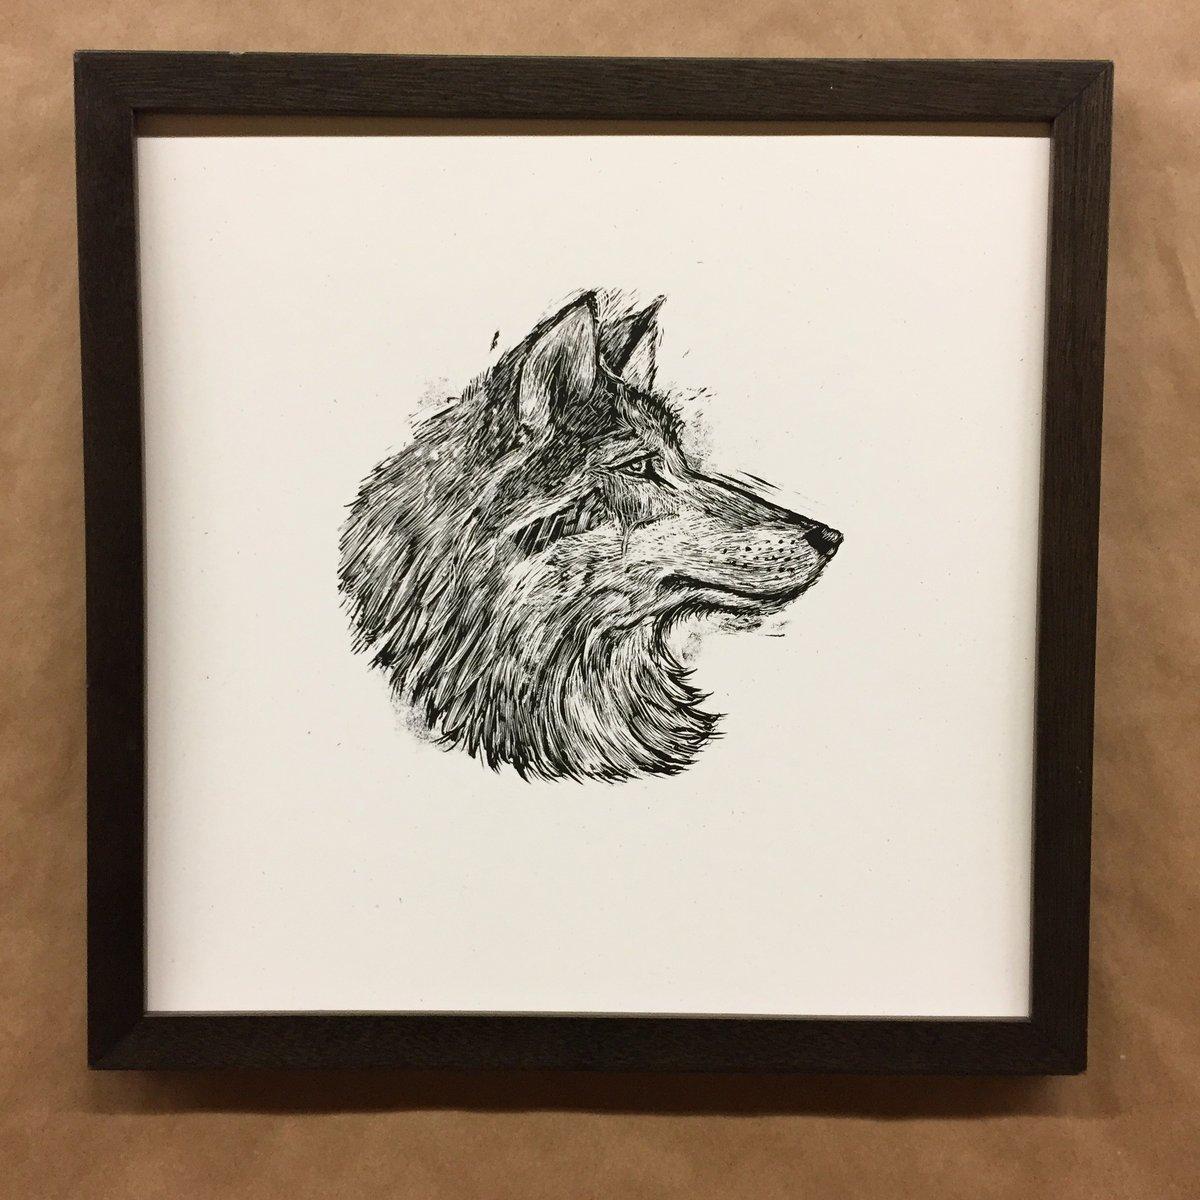 Reconstructed Timberwolf